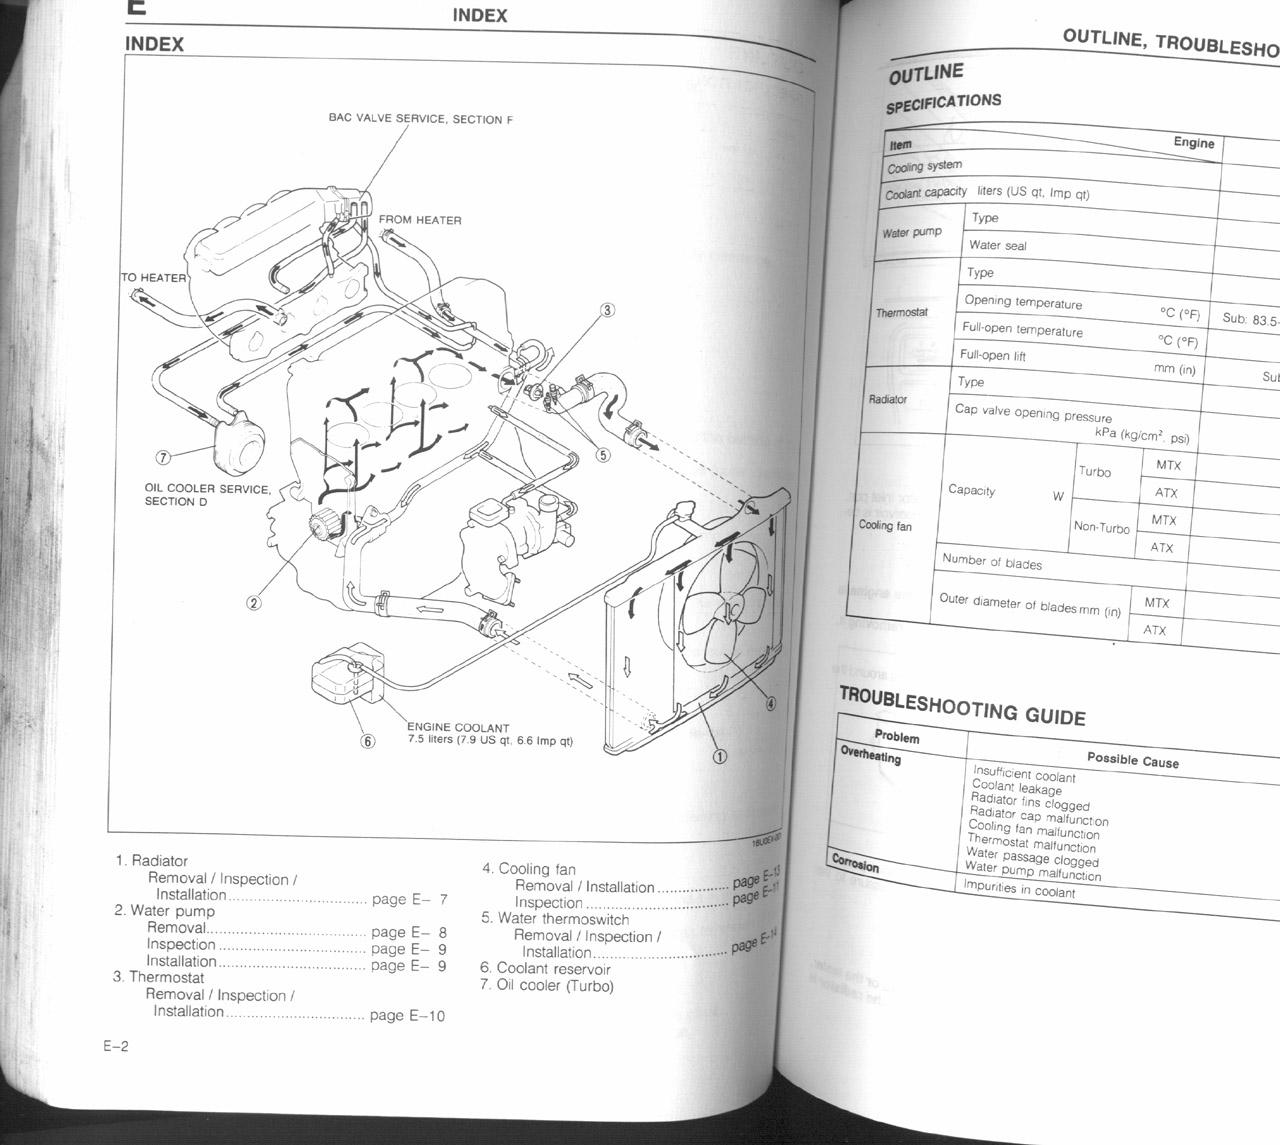 mazda 626 workshop manual pdf